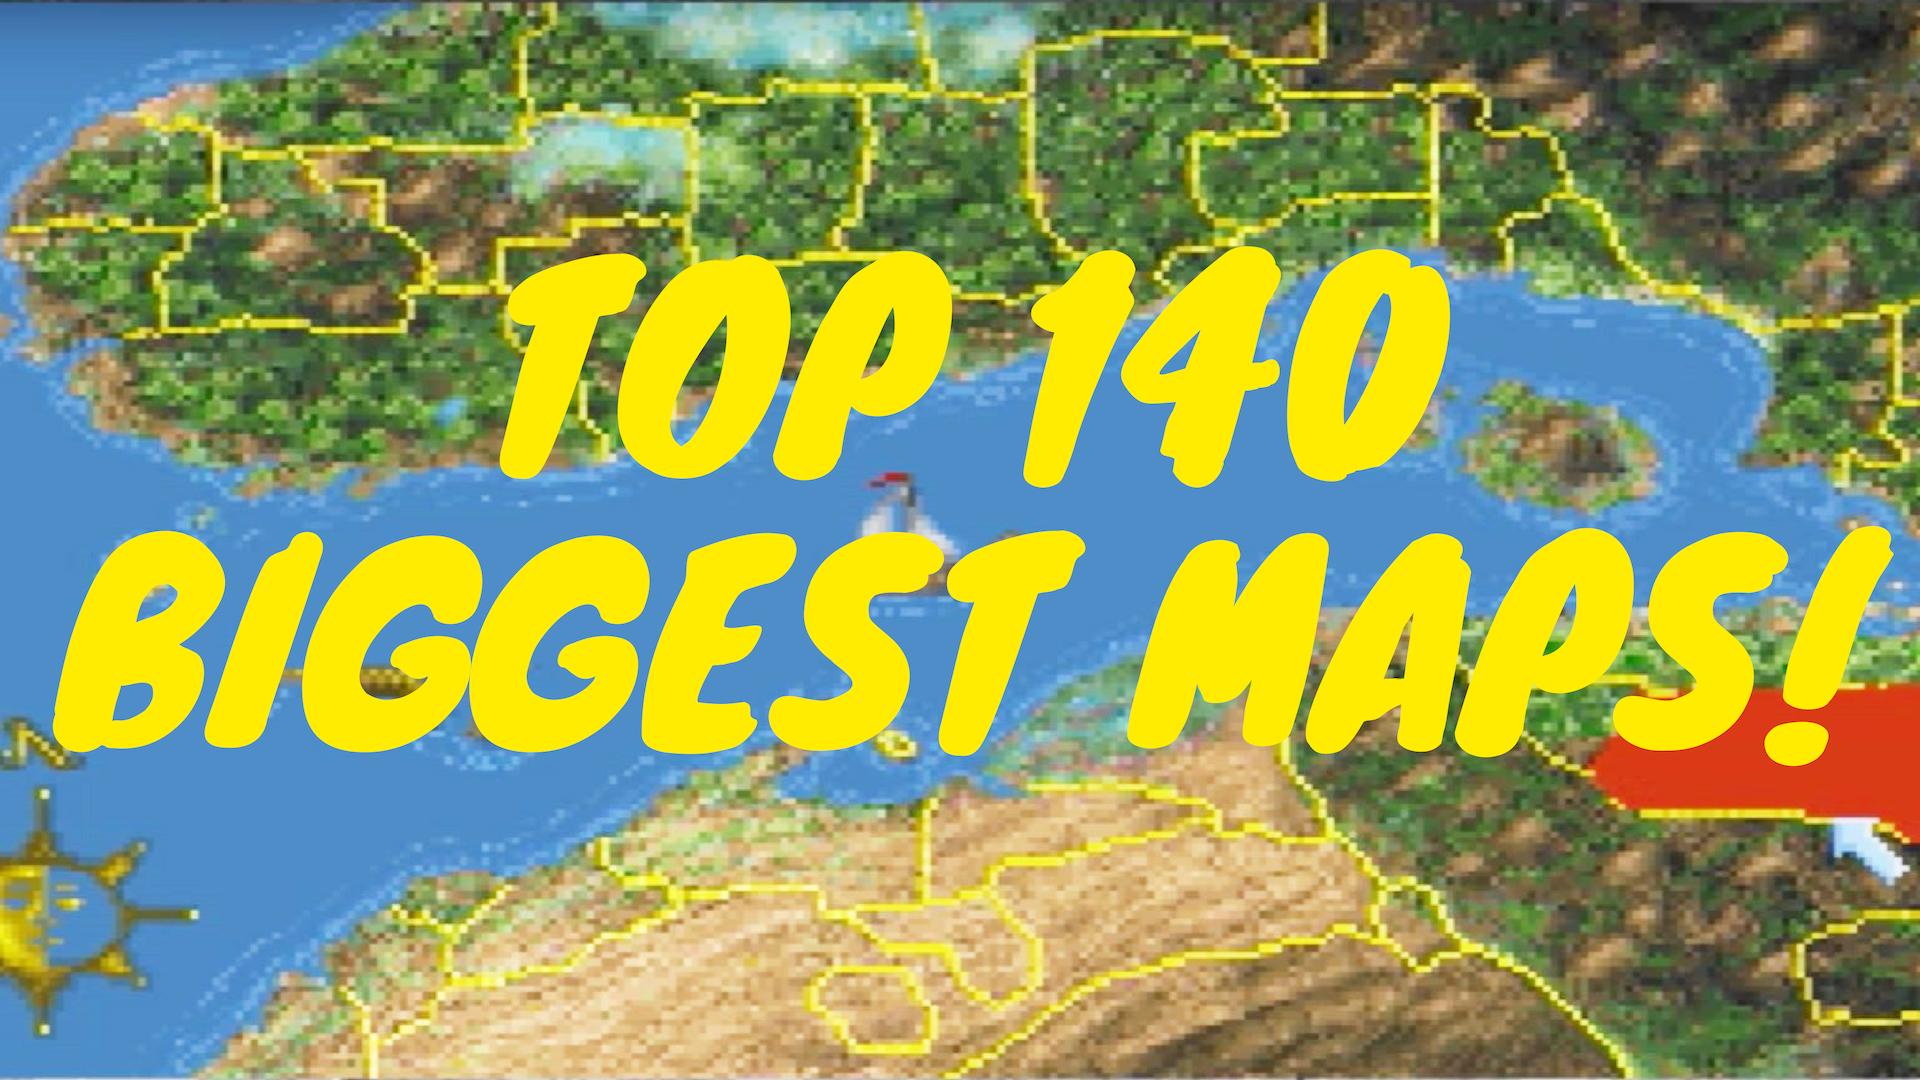 Video Games Maps Size Comparison Top 140 Biggest Maps How Big